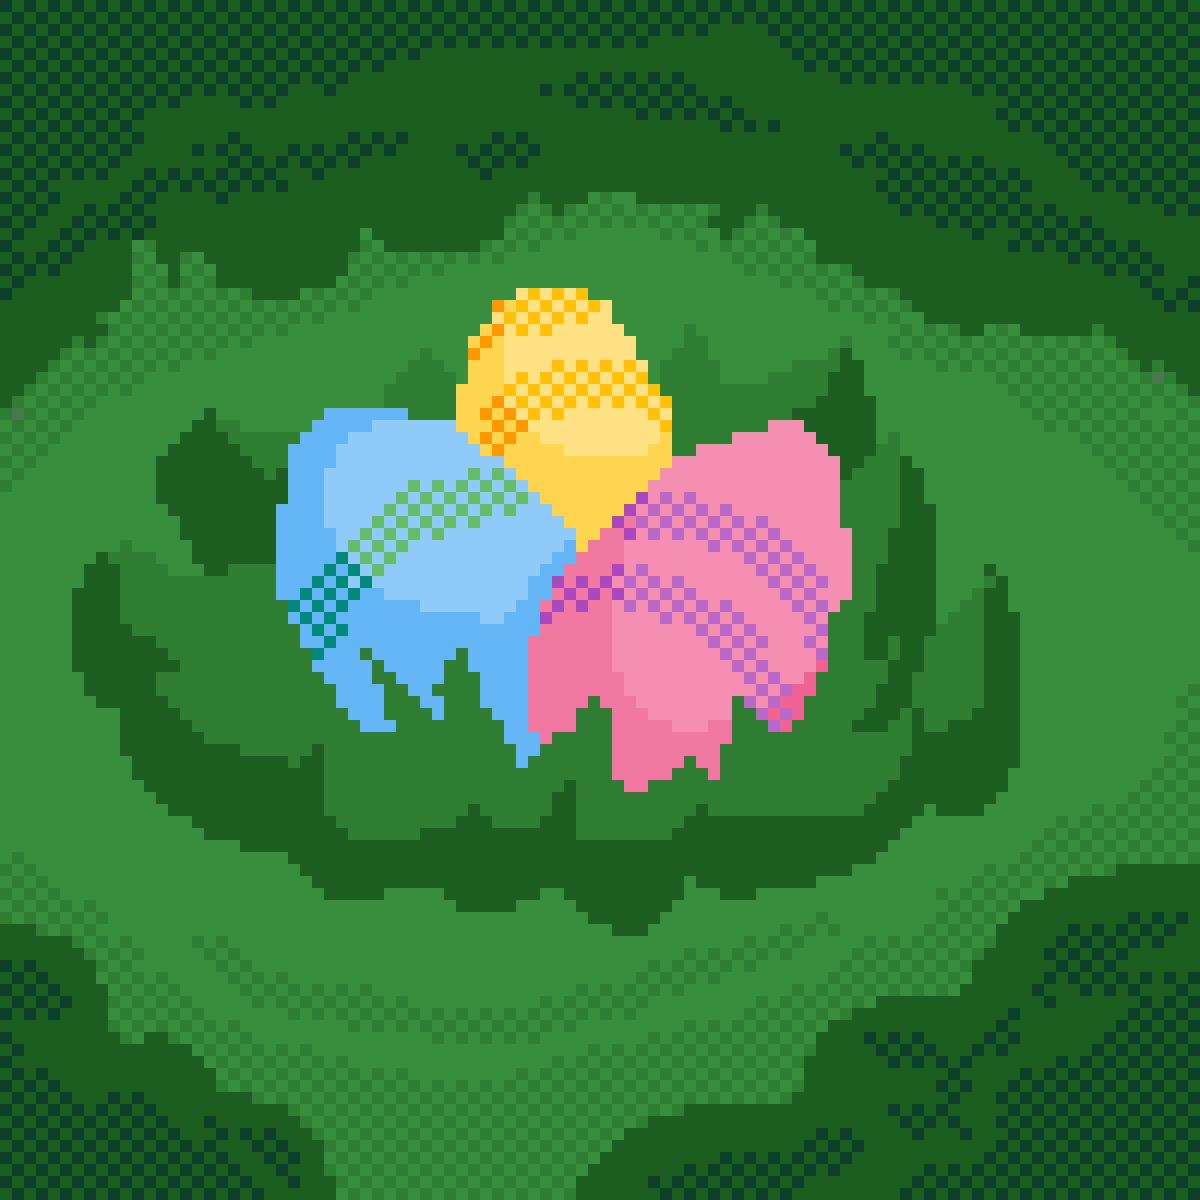 color eggs in feild by bordab